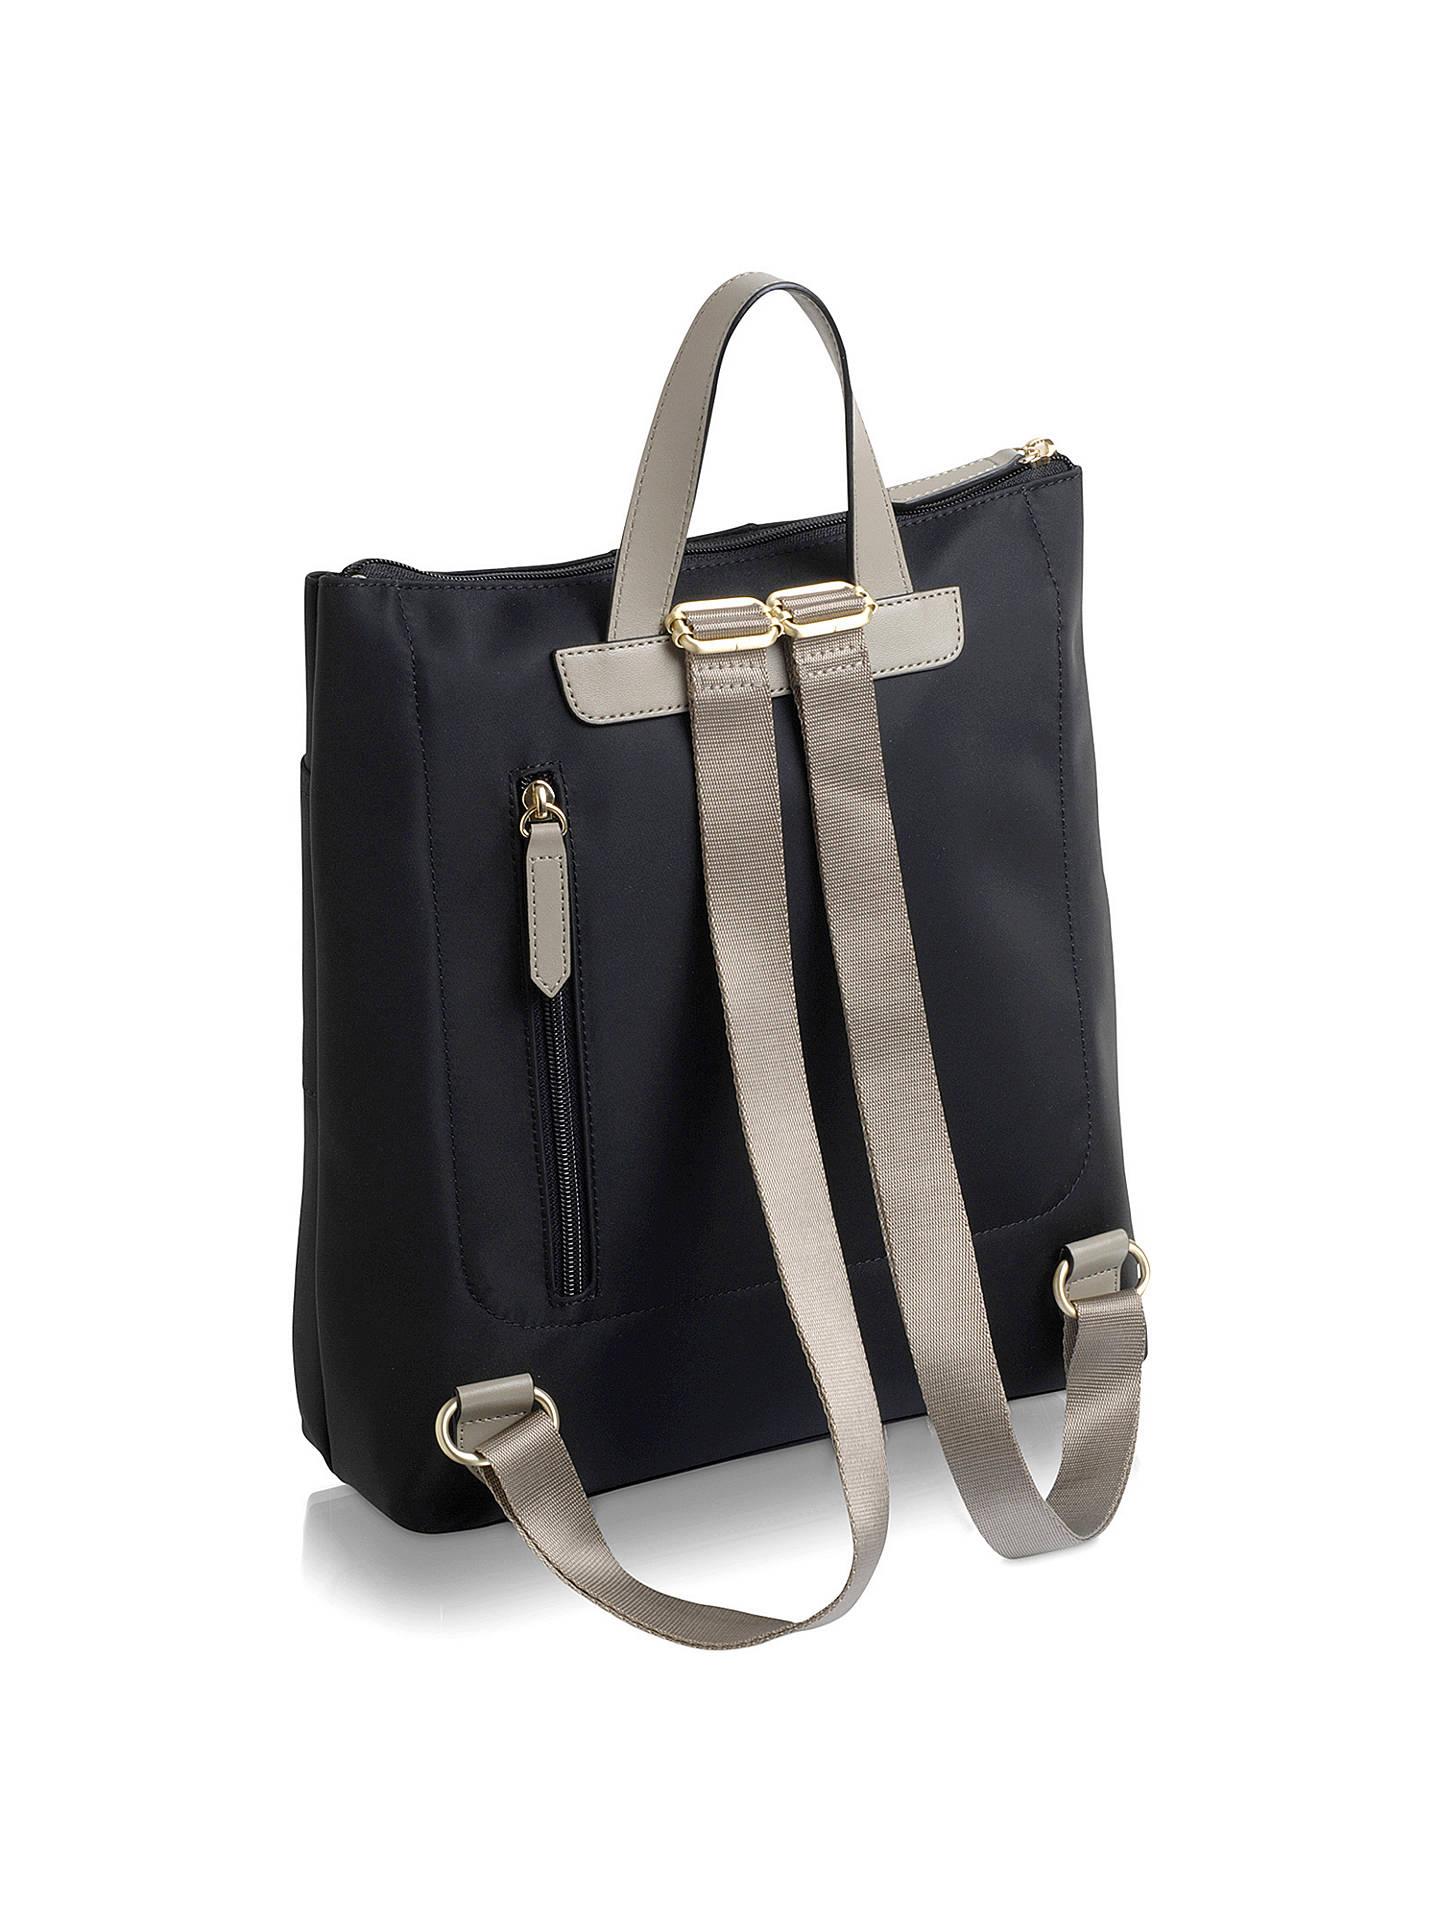 ... Buy Radley Pocket Essentials Large Backpack cc4e8969e69ba